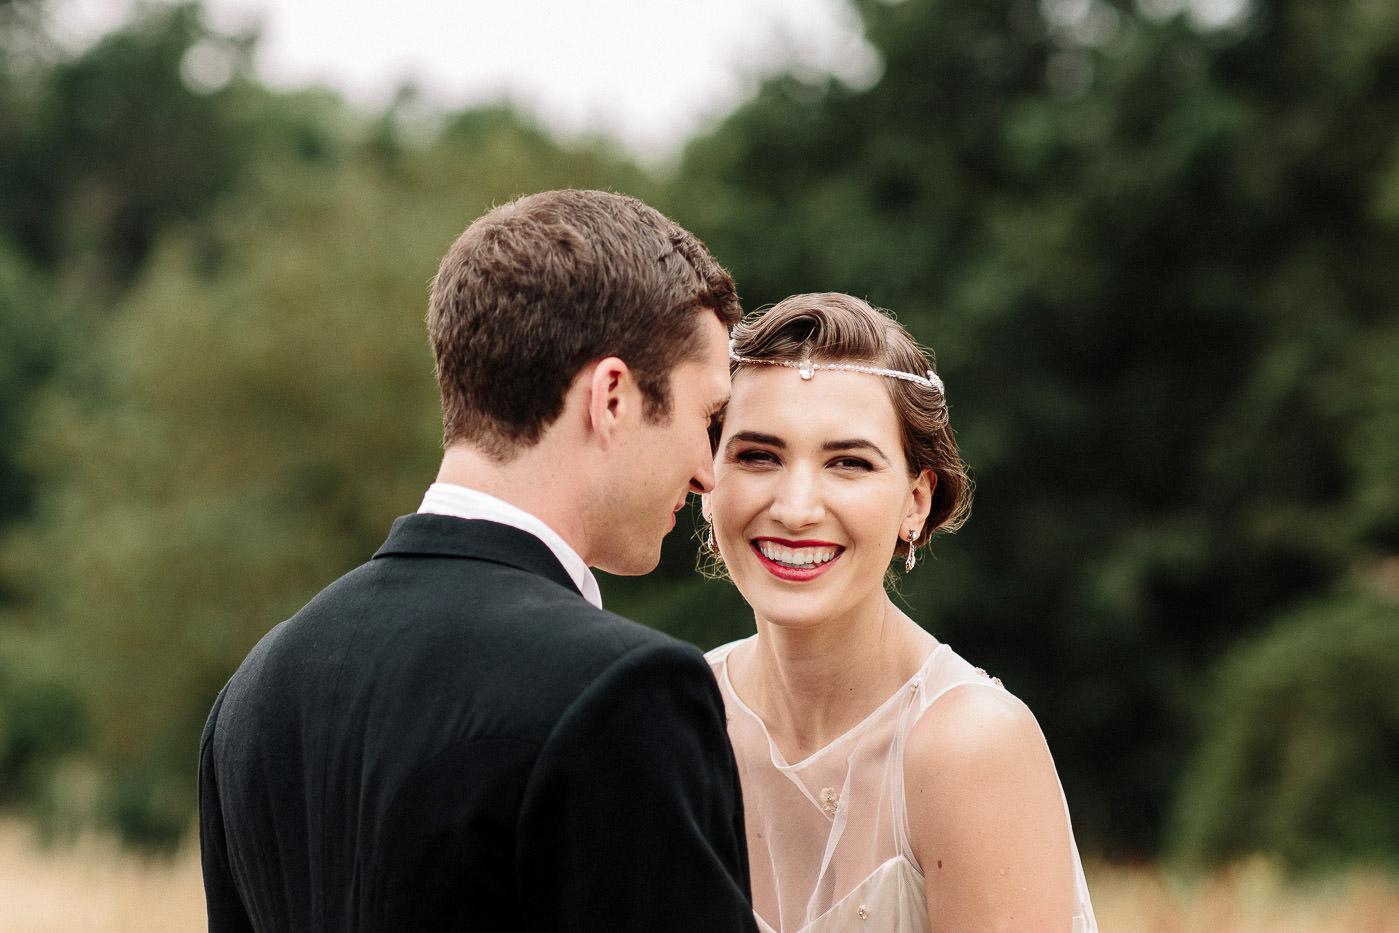 wedding-photographer-hertfordshire-82.jpg